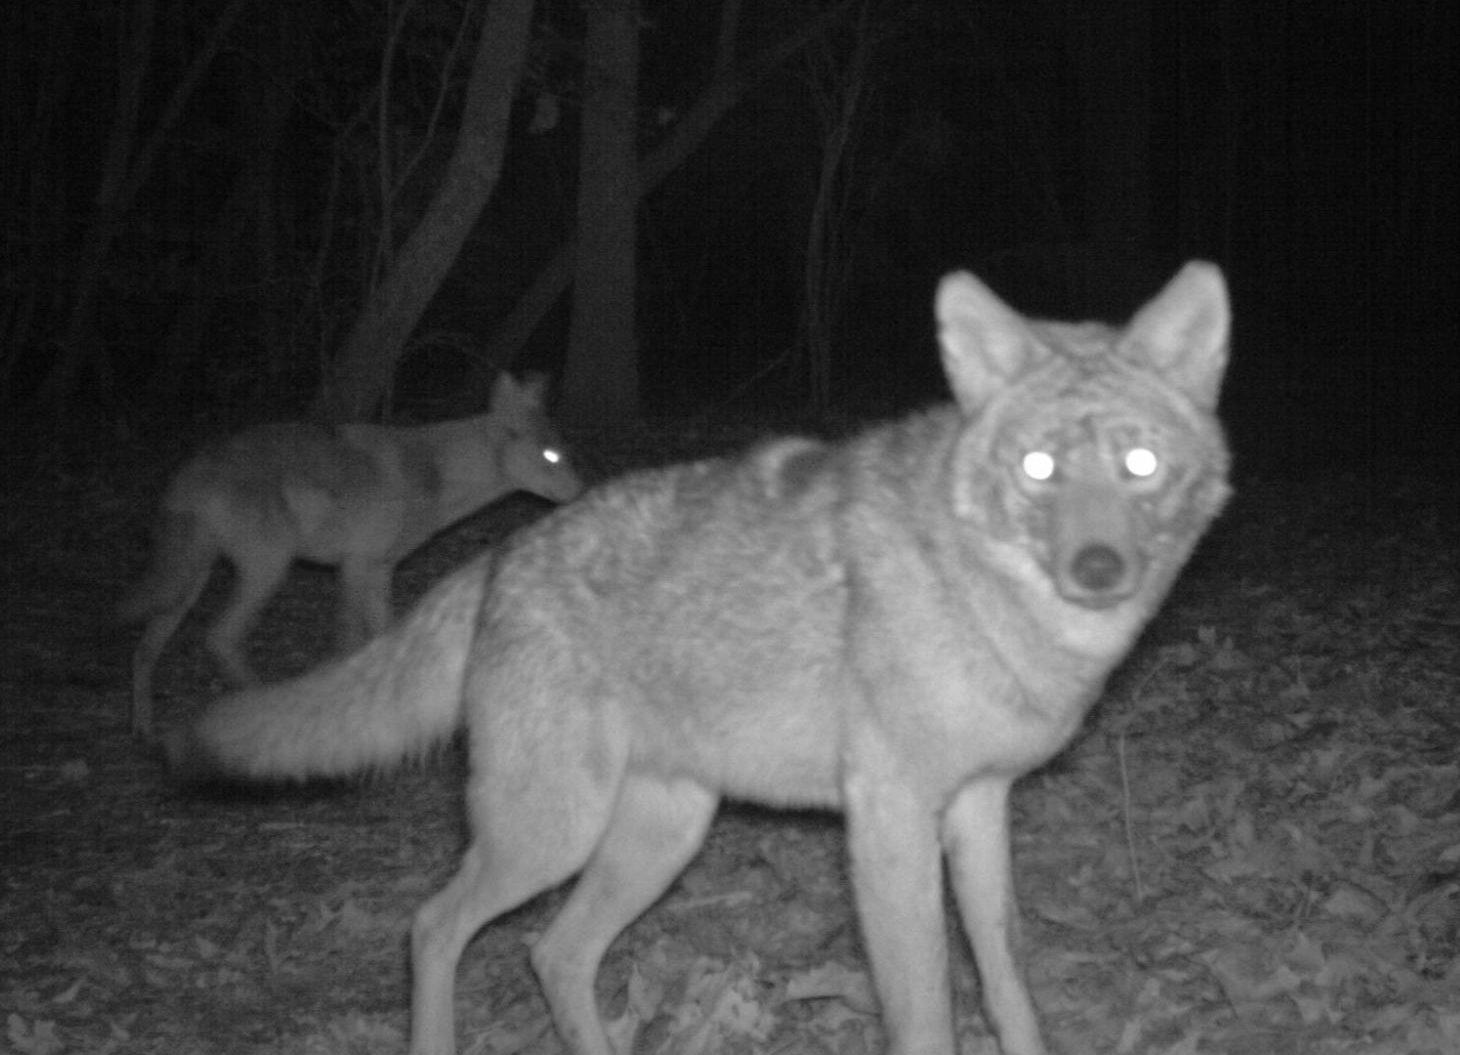 Do deer fear coyotes